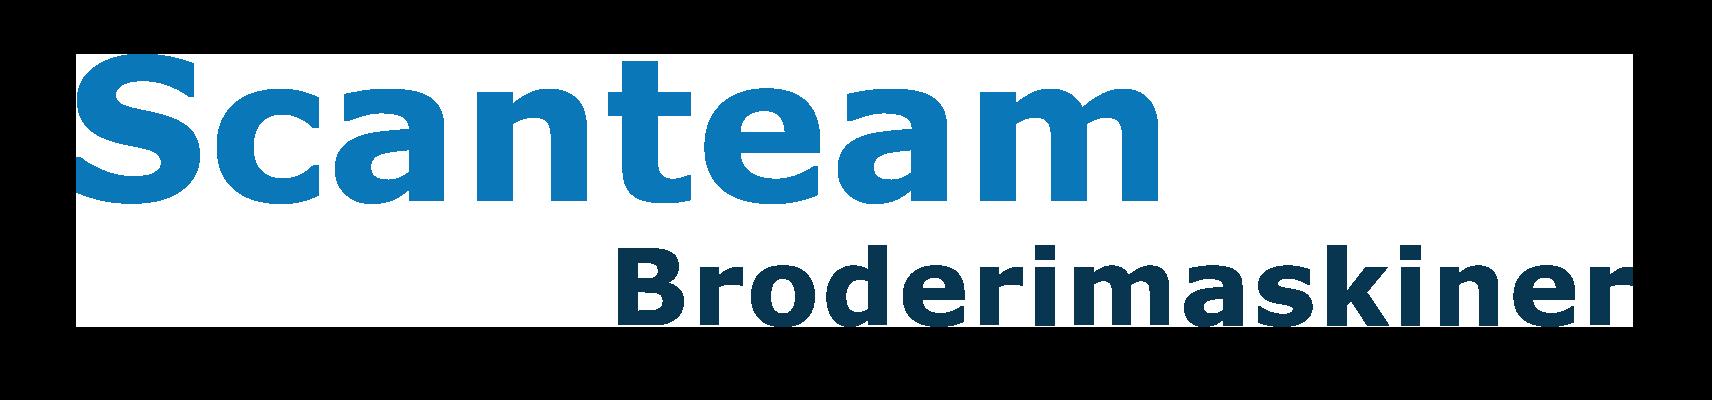 Logo Scanteam Broderimaskiner k3c